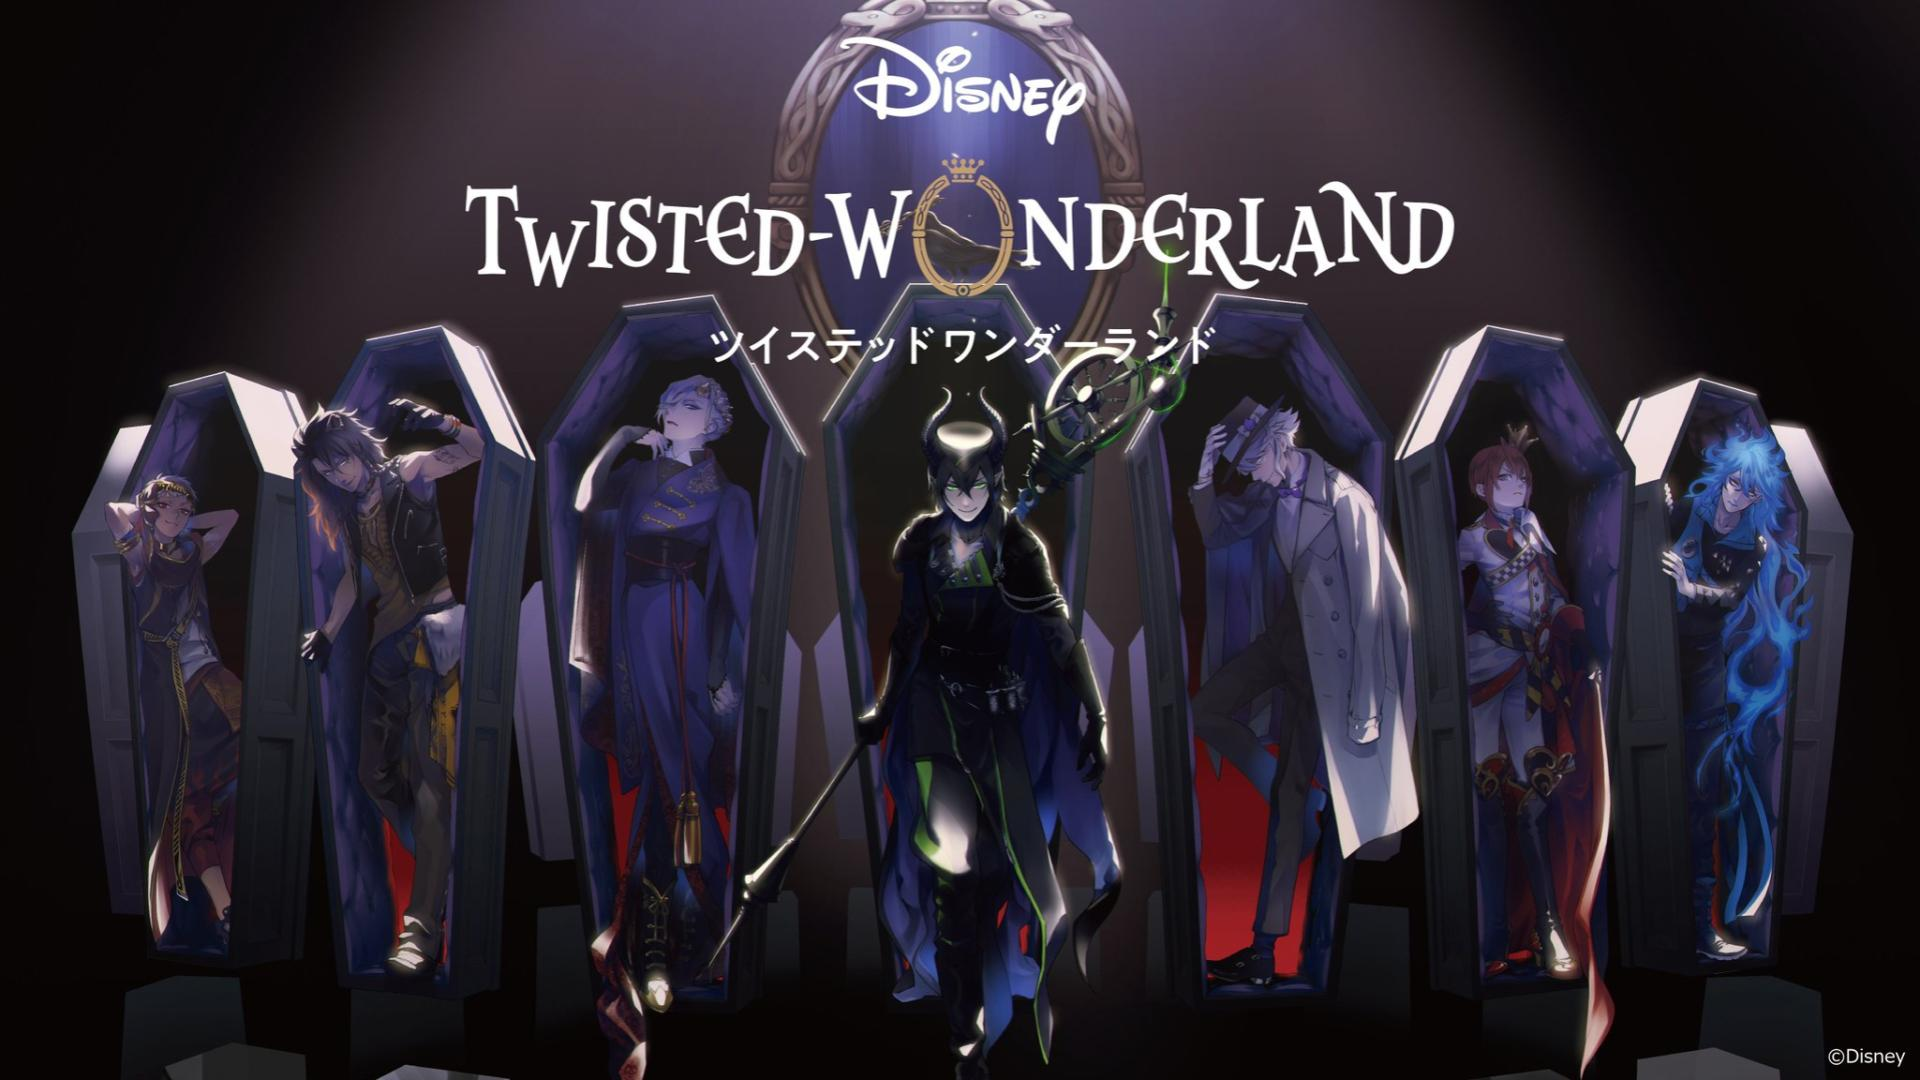 Disney Twisted Wonderland